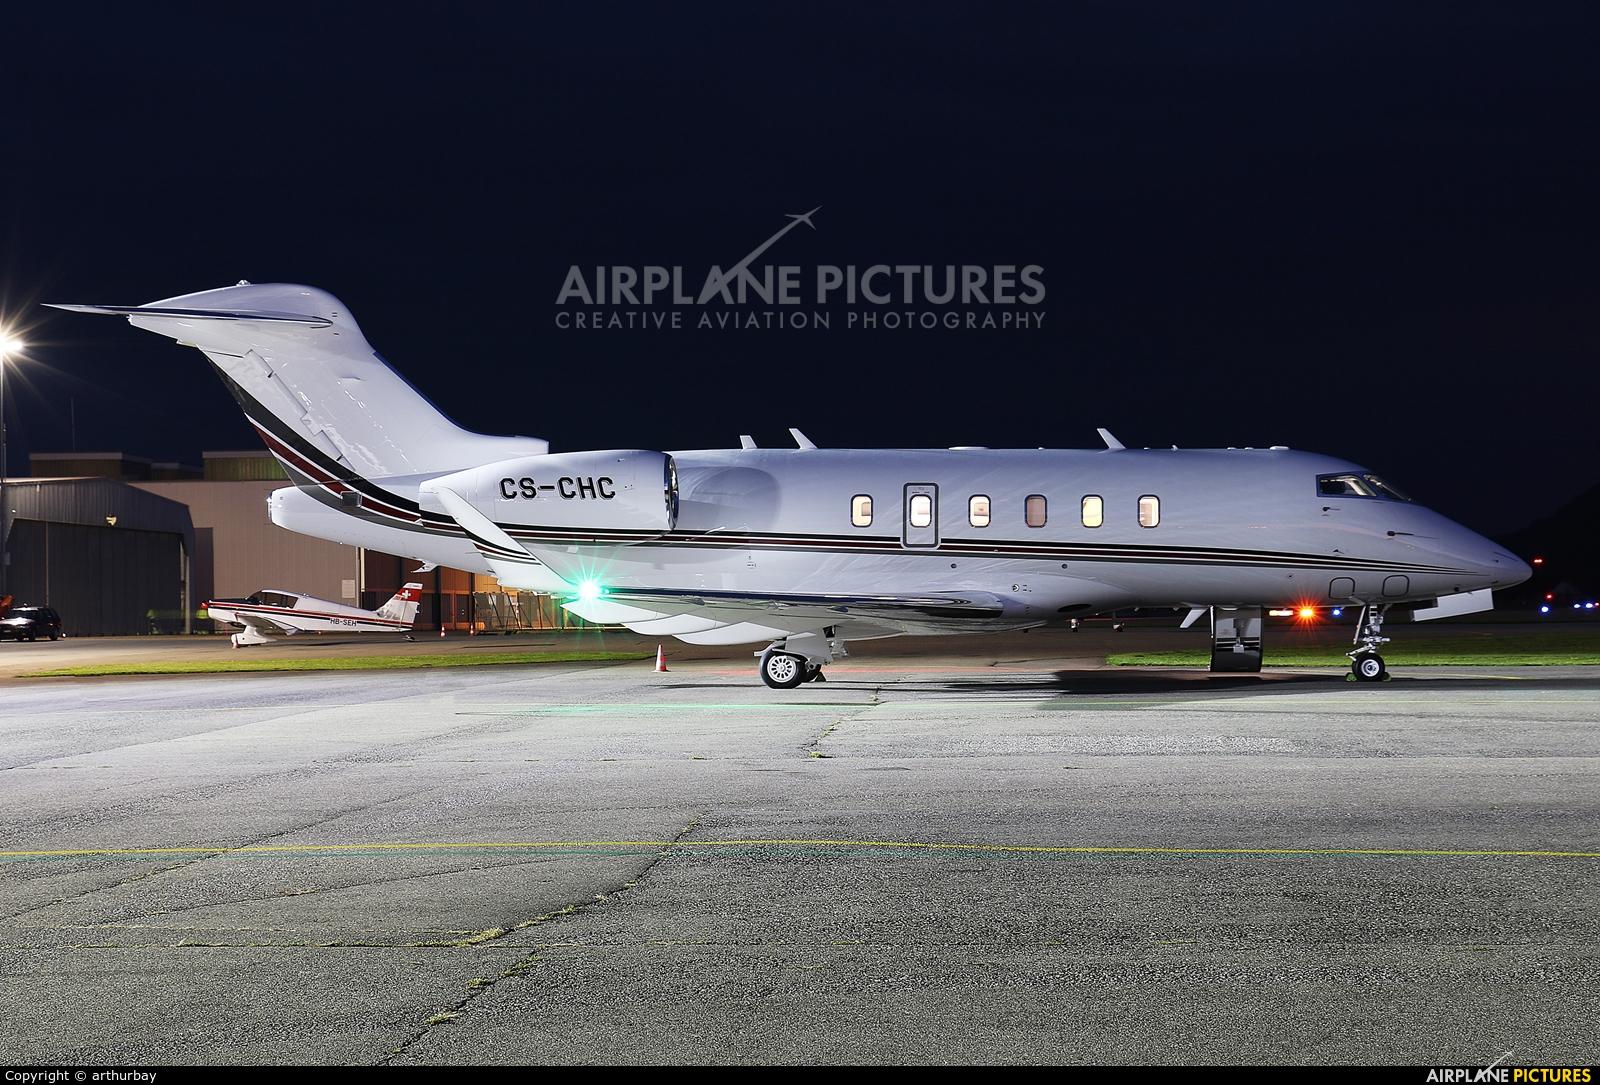 NetJets Europe (Portugal) CS-CHC aircraft at Bern - Belp